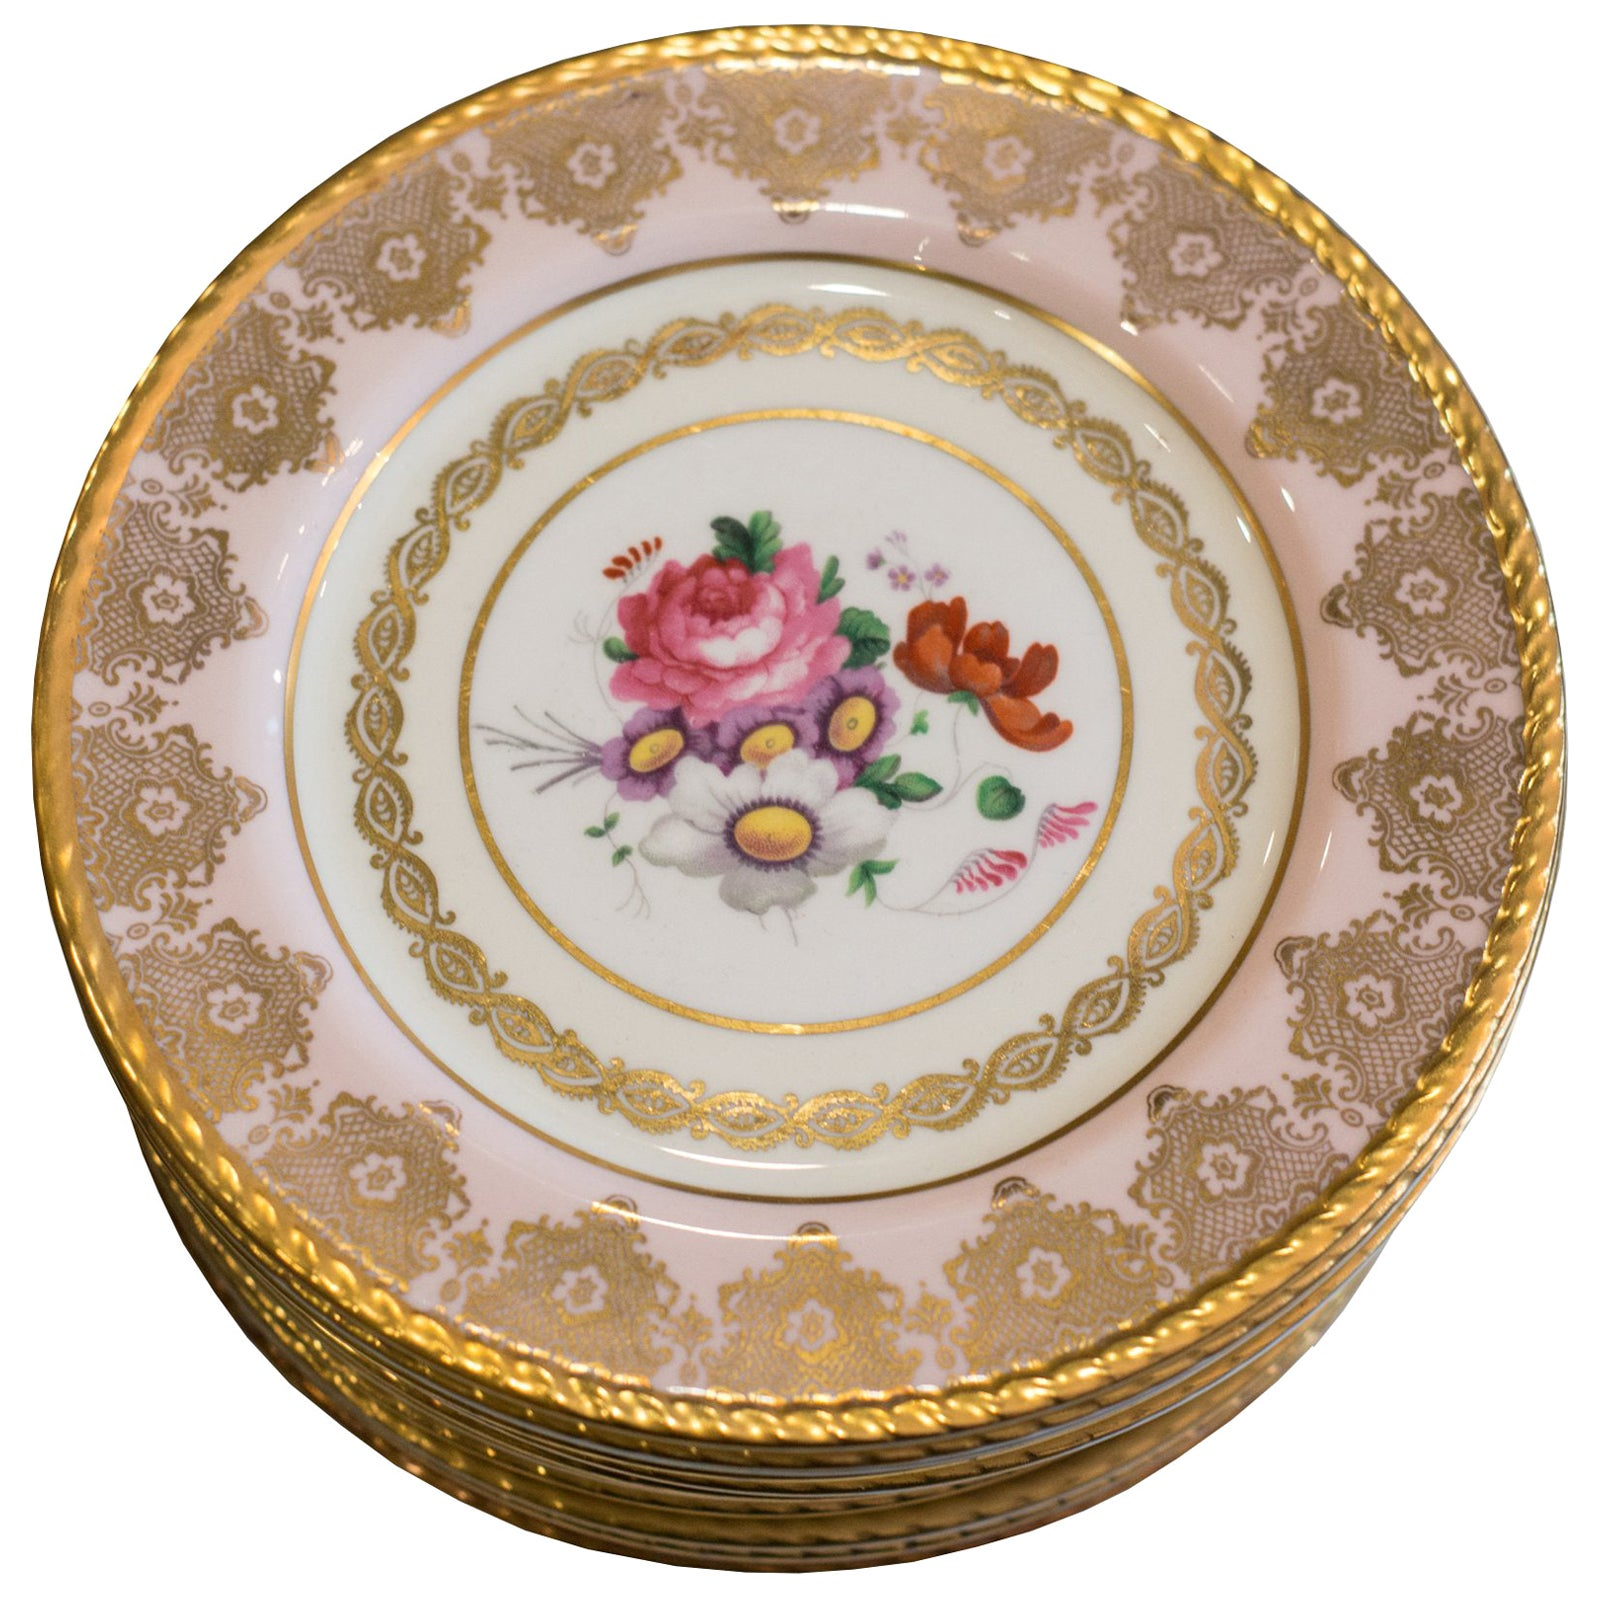 Antique Set of 15 Paragon Pink & Gold Dessert Plates